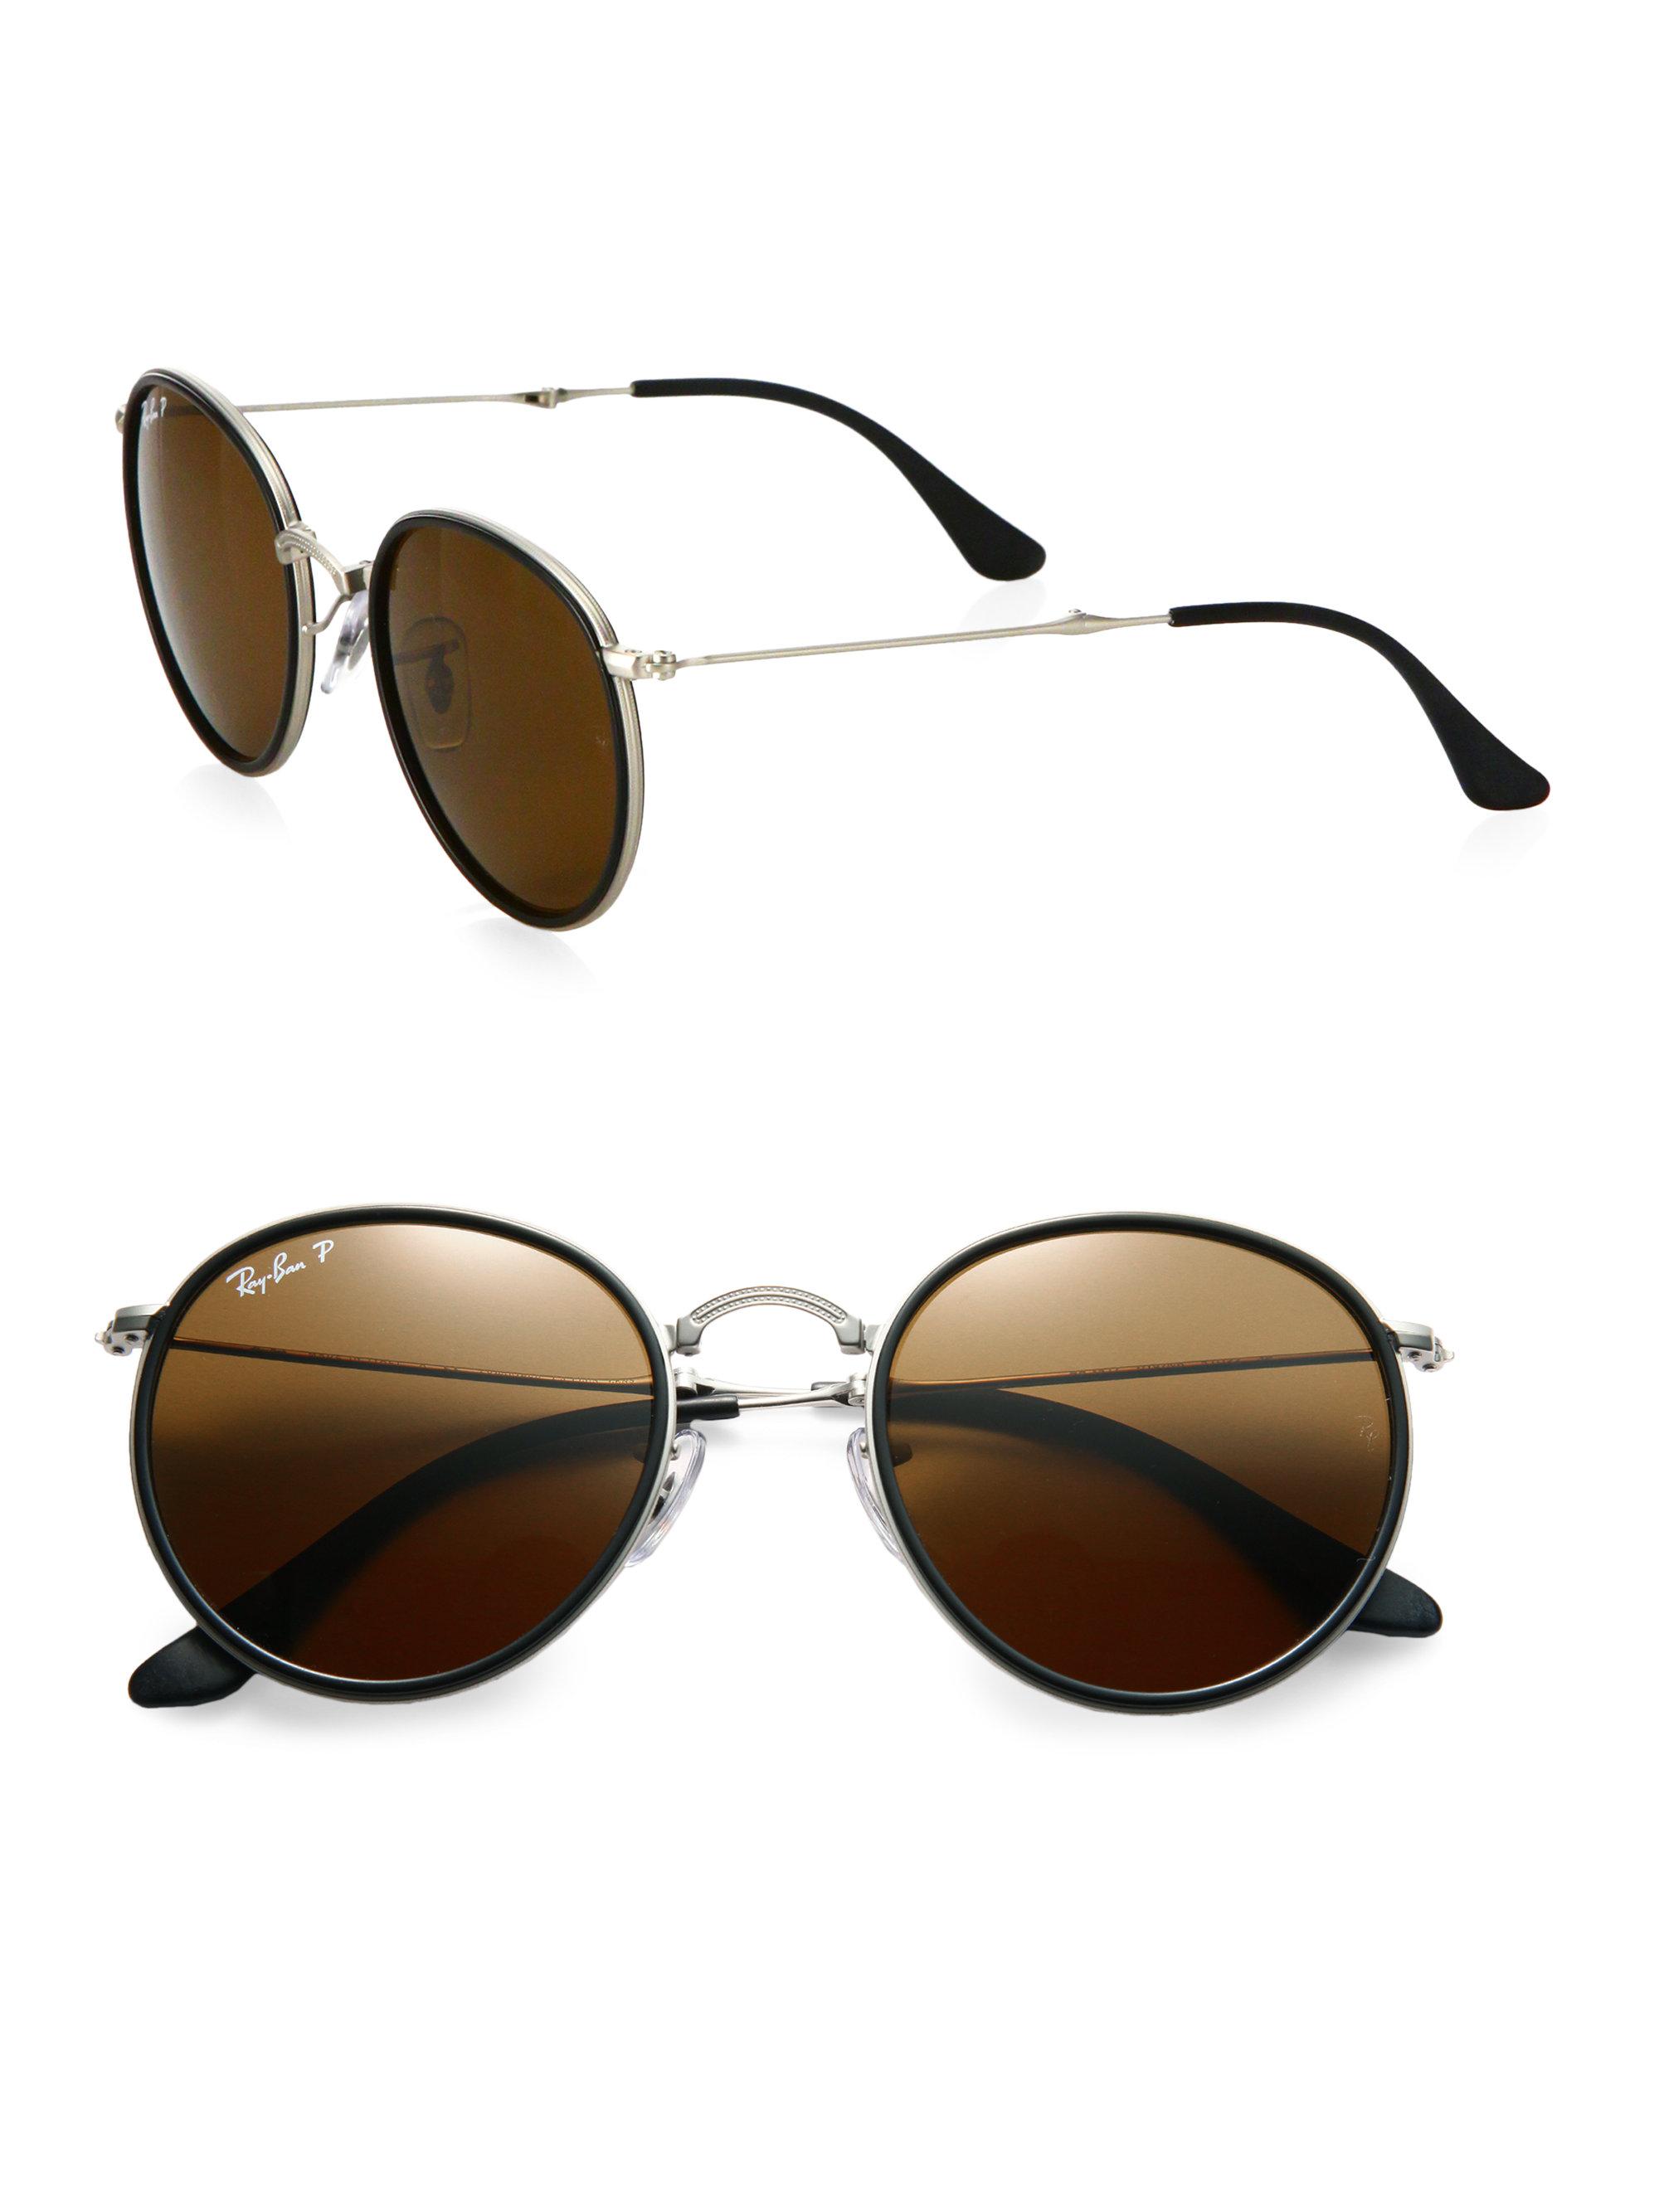 3e1ab9b9256 Gallery. Previously sold at  Saks Fifth Avenue · Men s Wayfarer Sunglasses  Men s Ray Ban ...